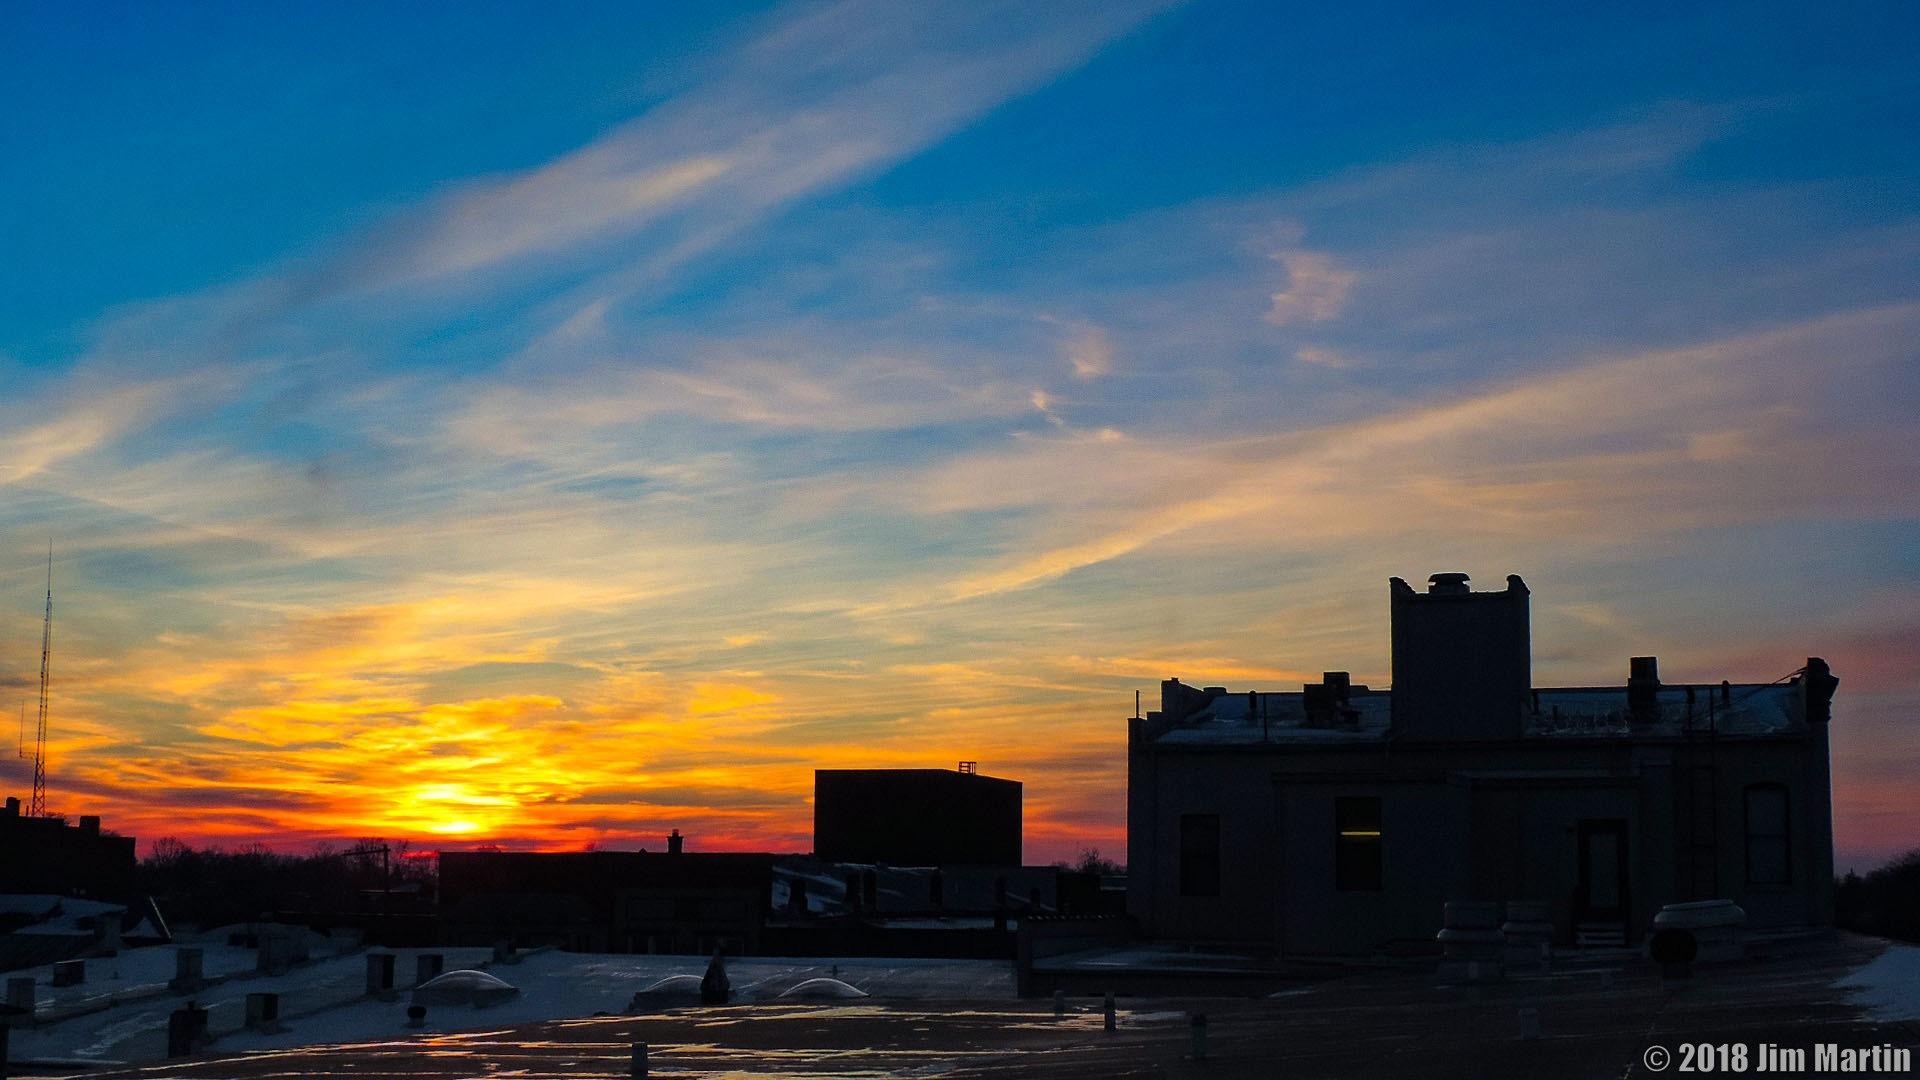 Winter Sunset by Jim Martin